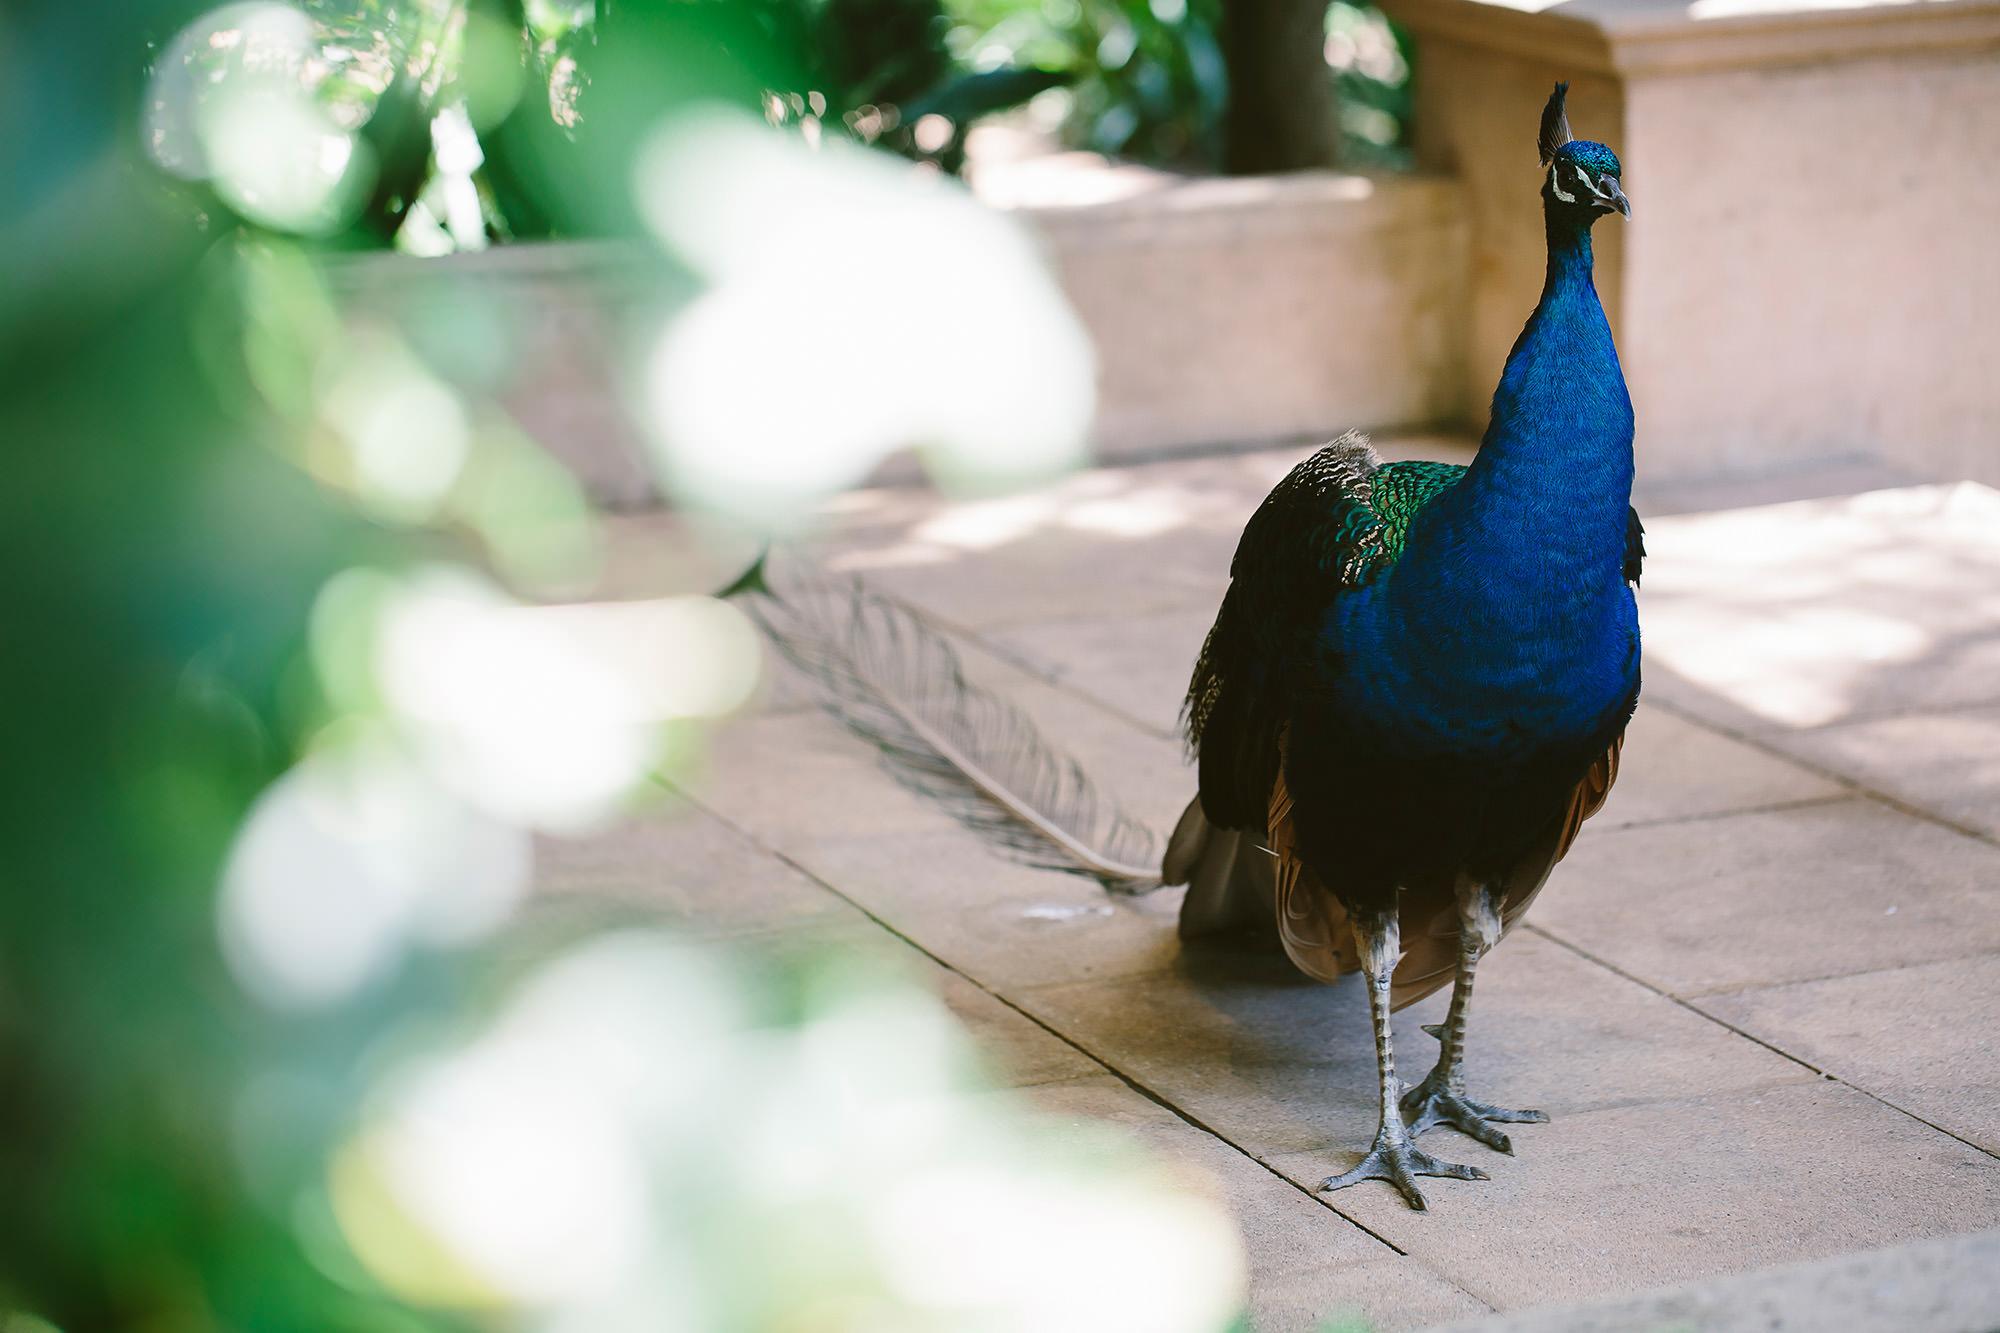 jaspers berry wedding venue resident peacock